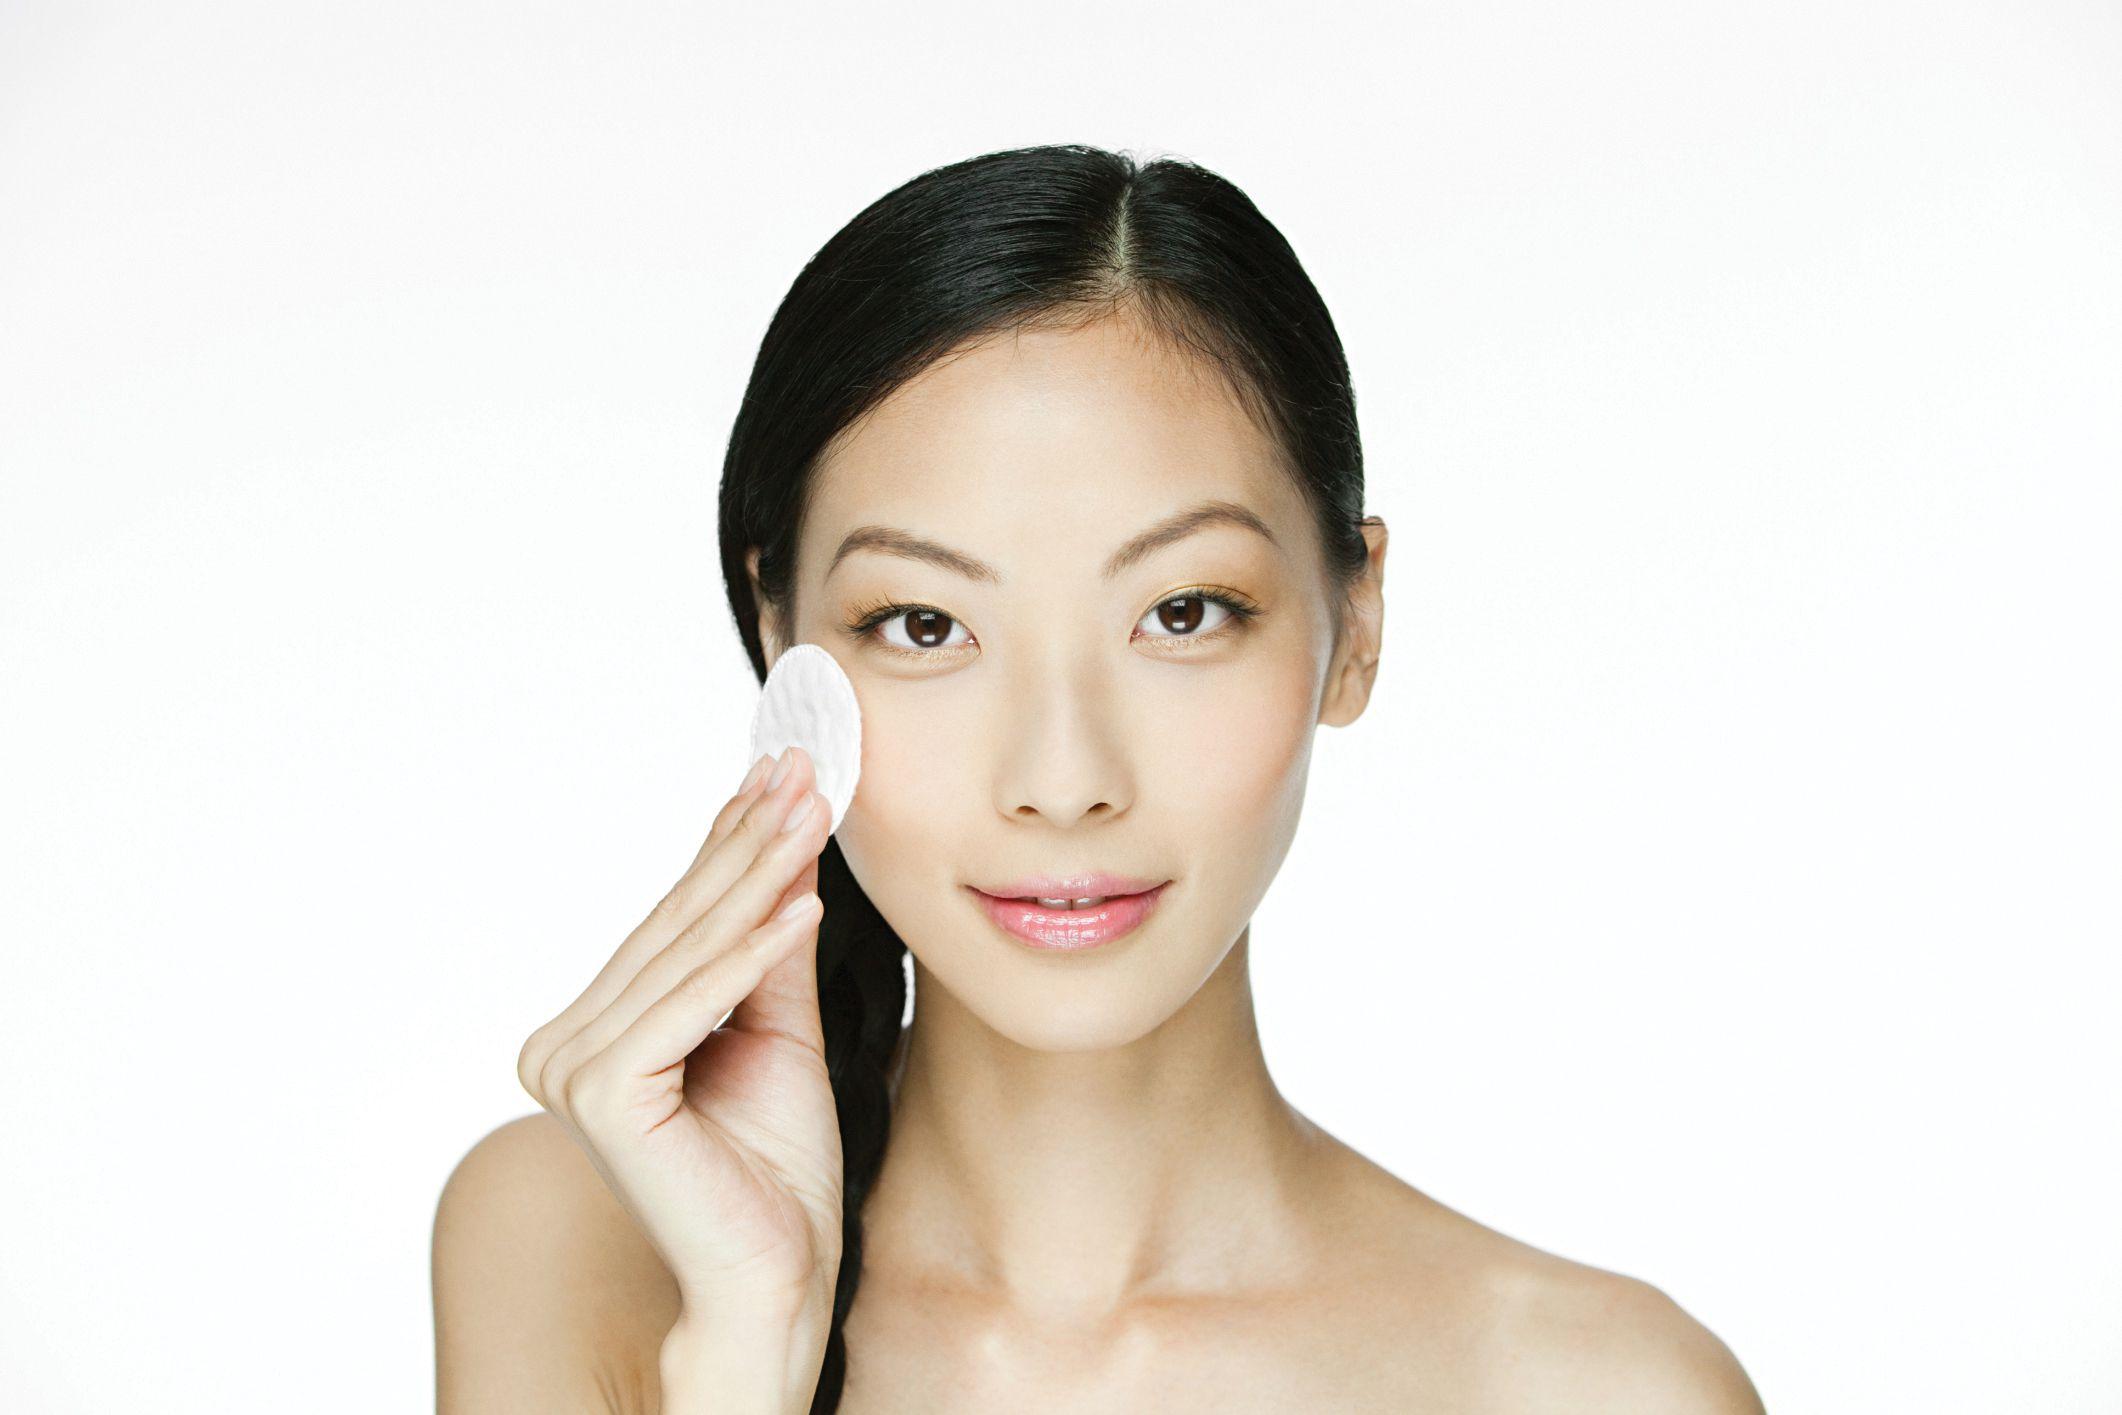 Temeljito čišćenje lica: savršen ten